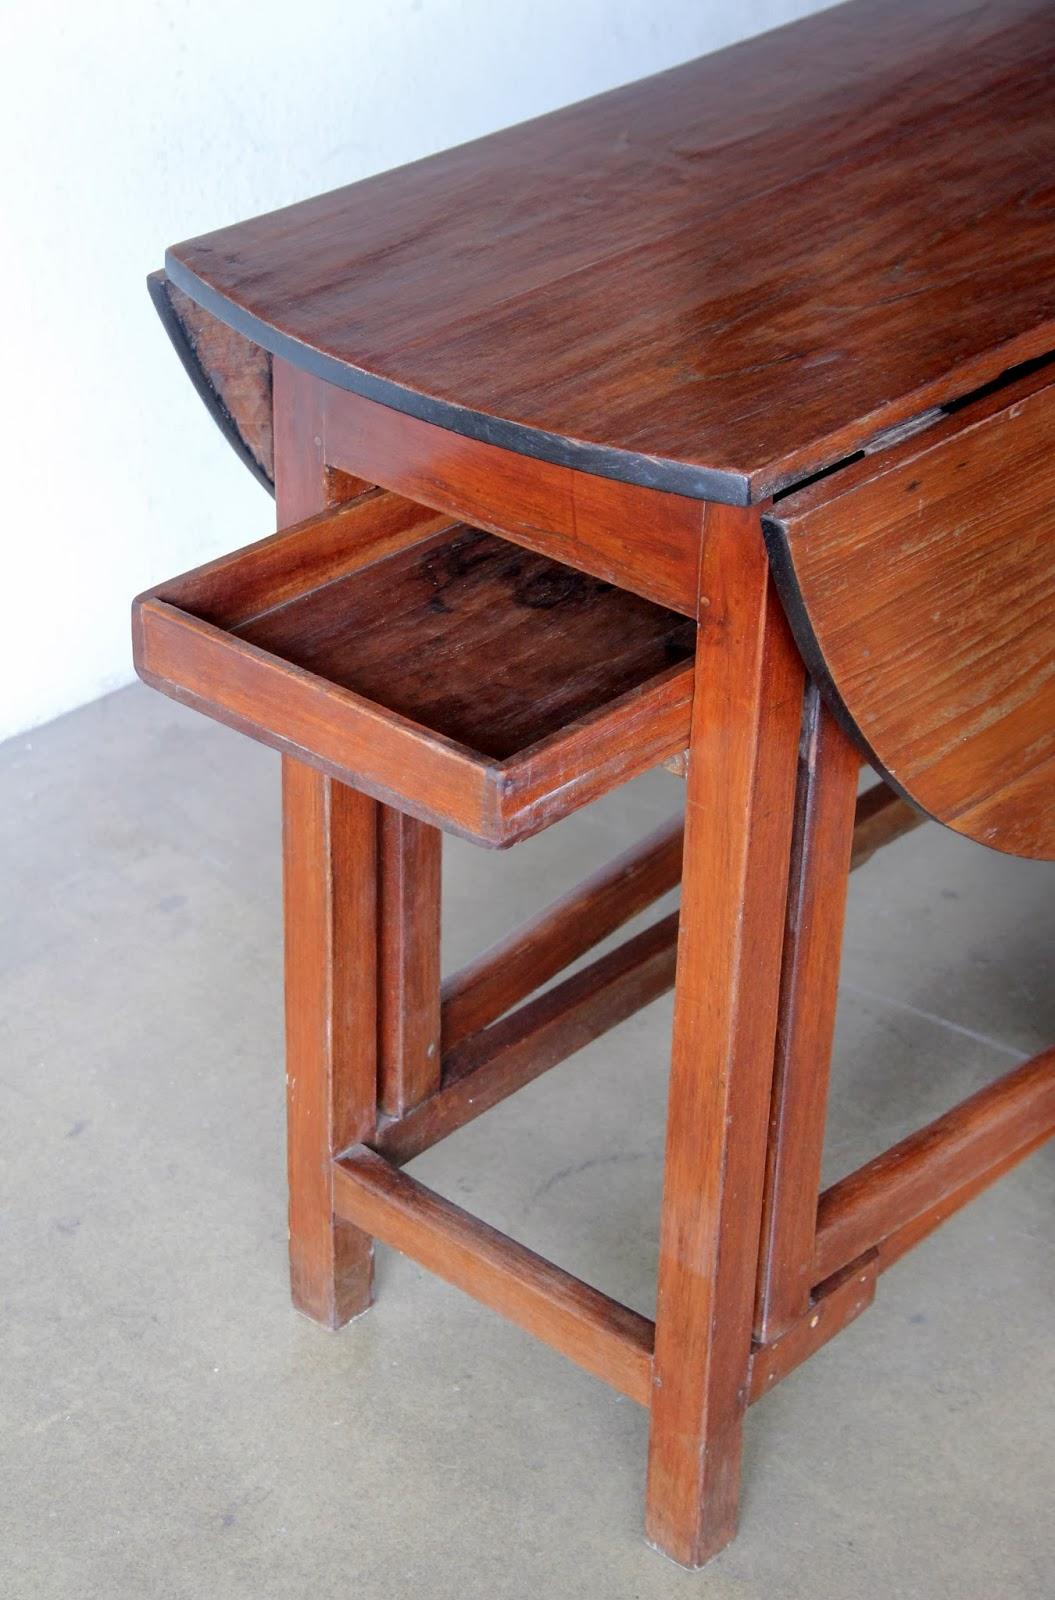 Vintage love vintage furniture restored and reupholstered ashley furniture - Gateleg table with drawers ...